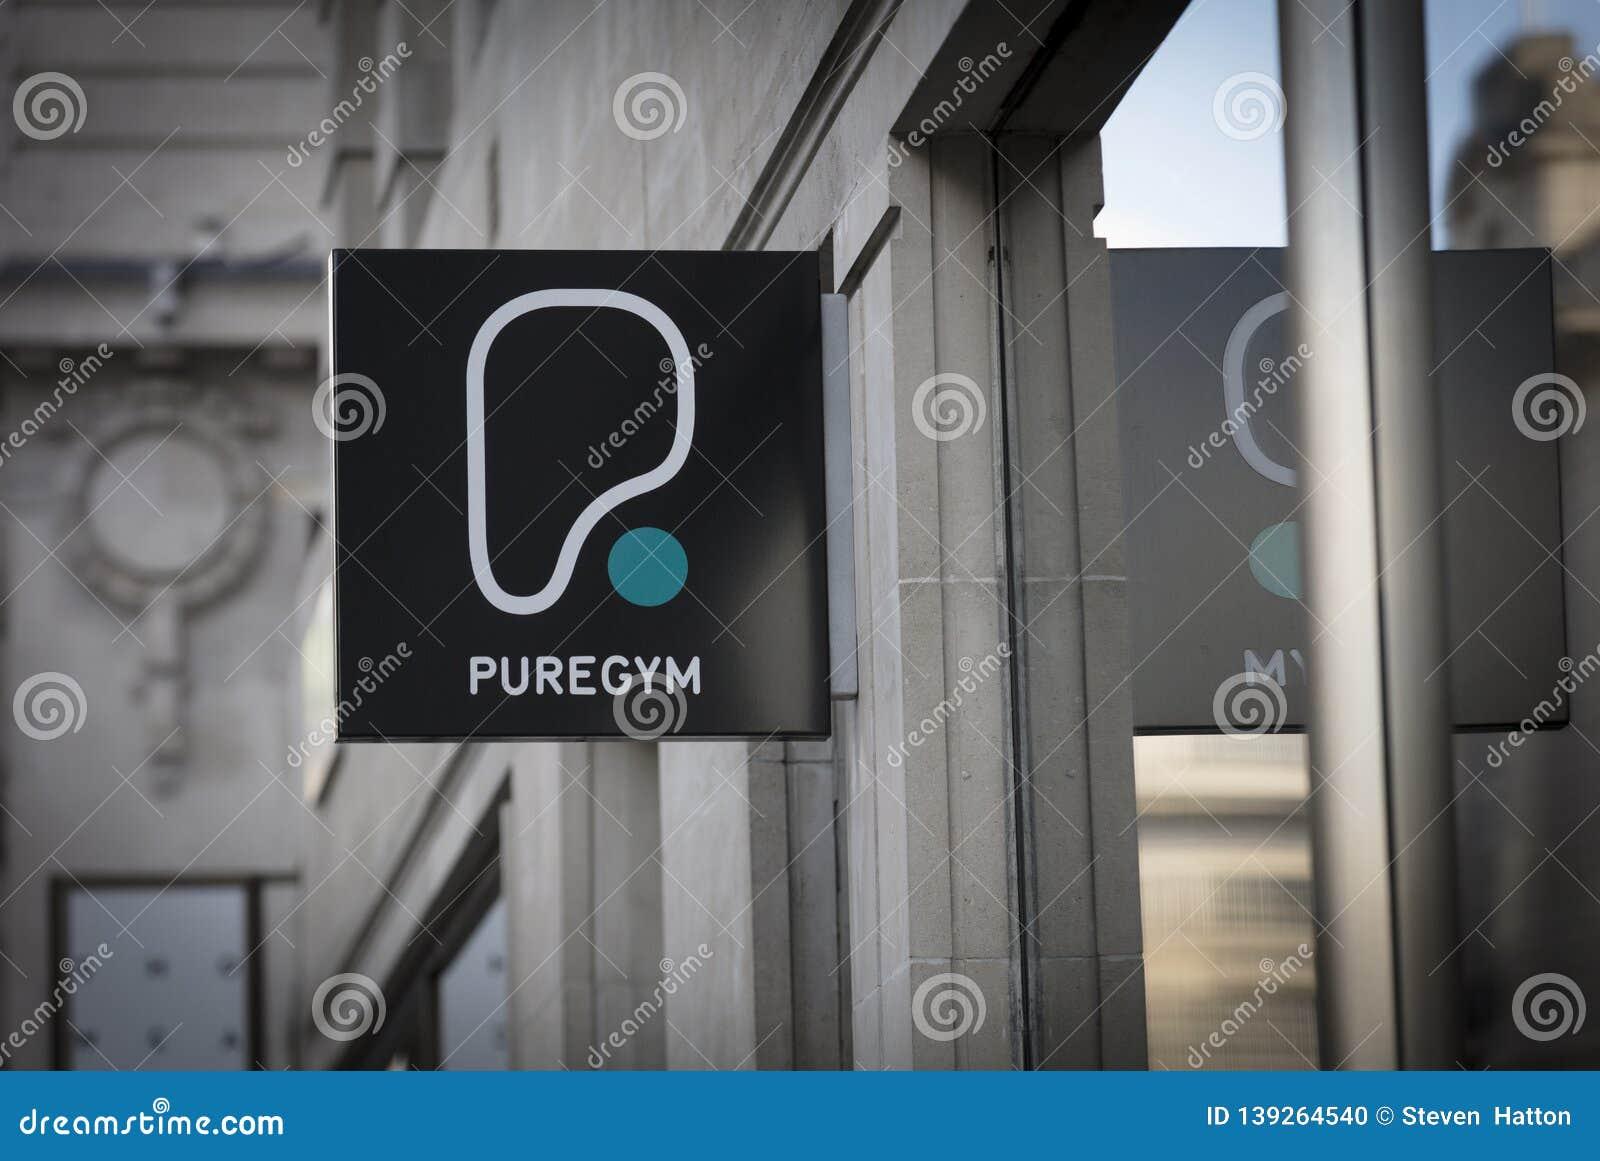 Pure Gym Canary Wharf >> London Greater London United Kingdom 7th February 2018 A